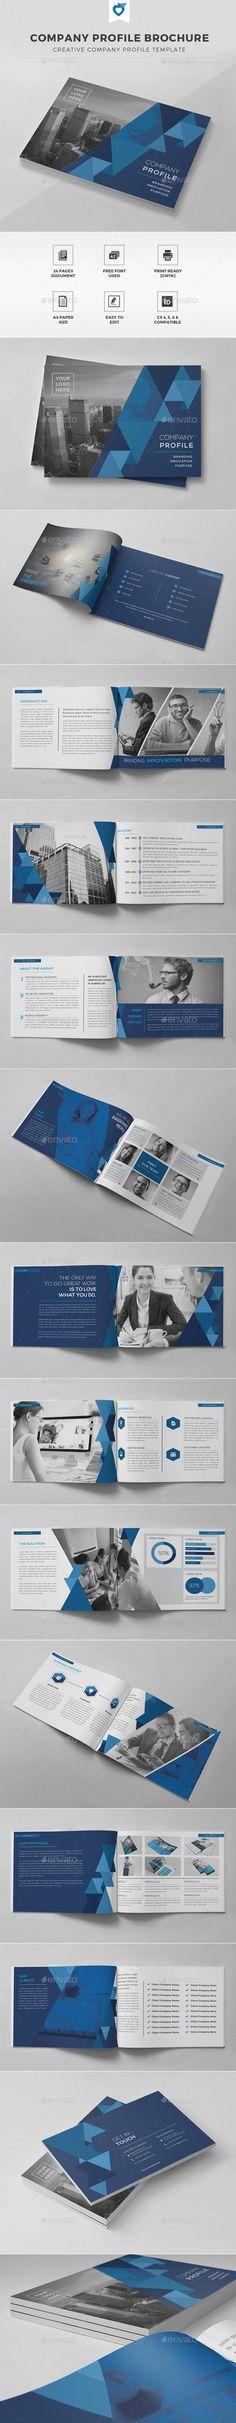 Company Profile Brochure Template #design Download: http://graphicriver.net/item/company-profile-brochure/11808076?ref=ksioks: